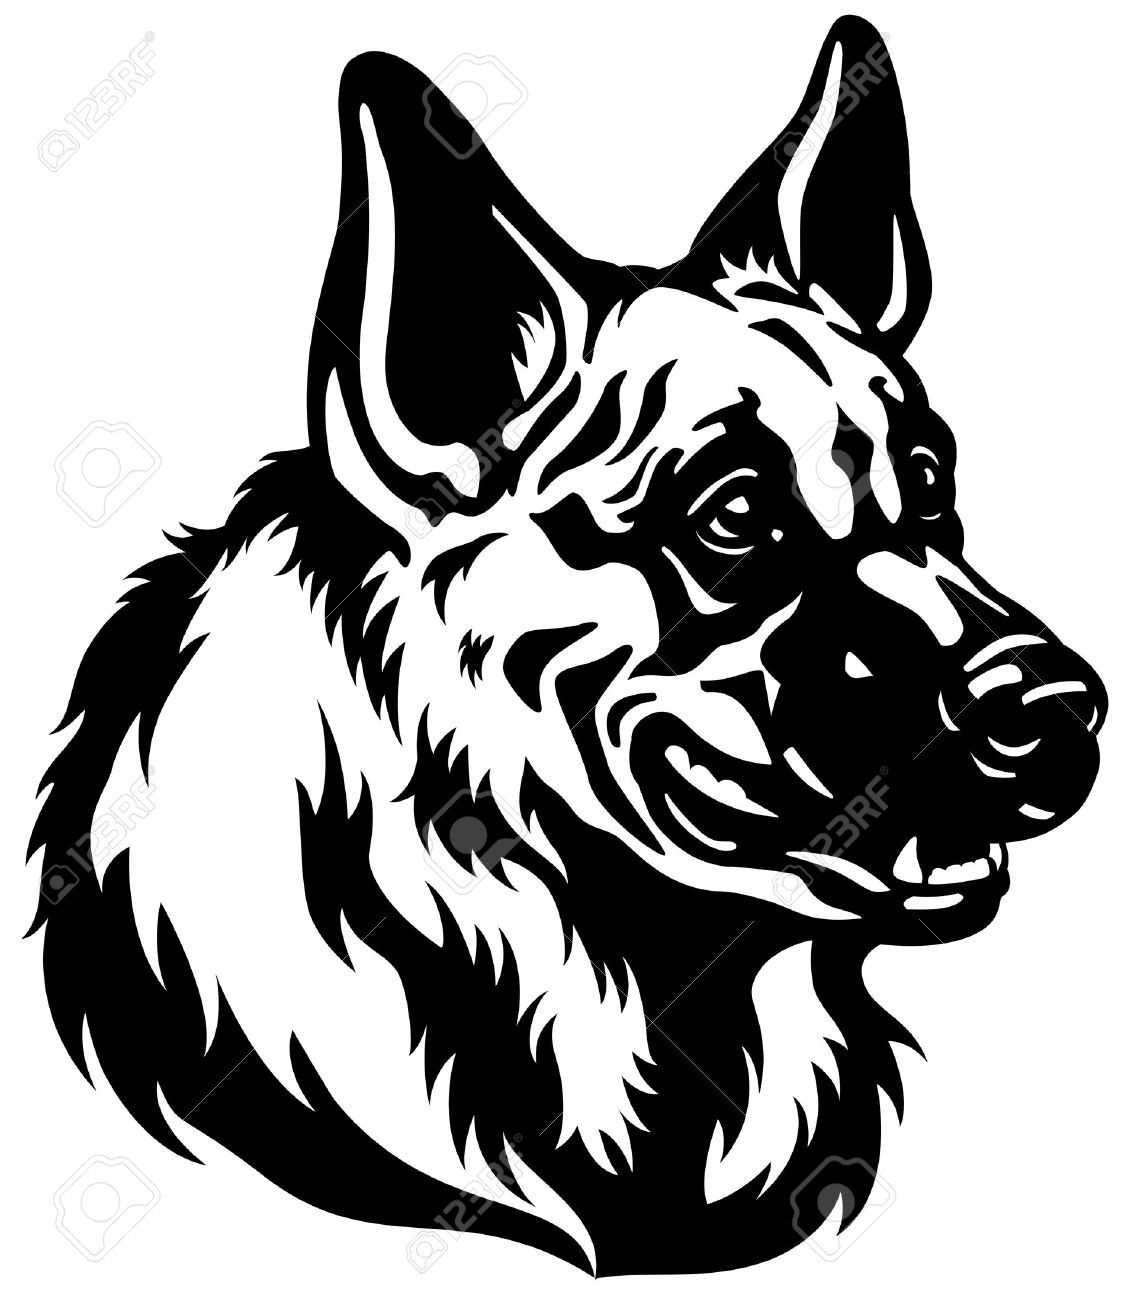 Pin By Teresa Fogerty On Cameo Silhouette Animals Black And White Illustration German Shepherd Dogs German Shepherd